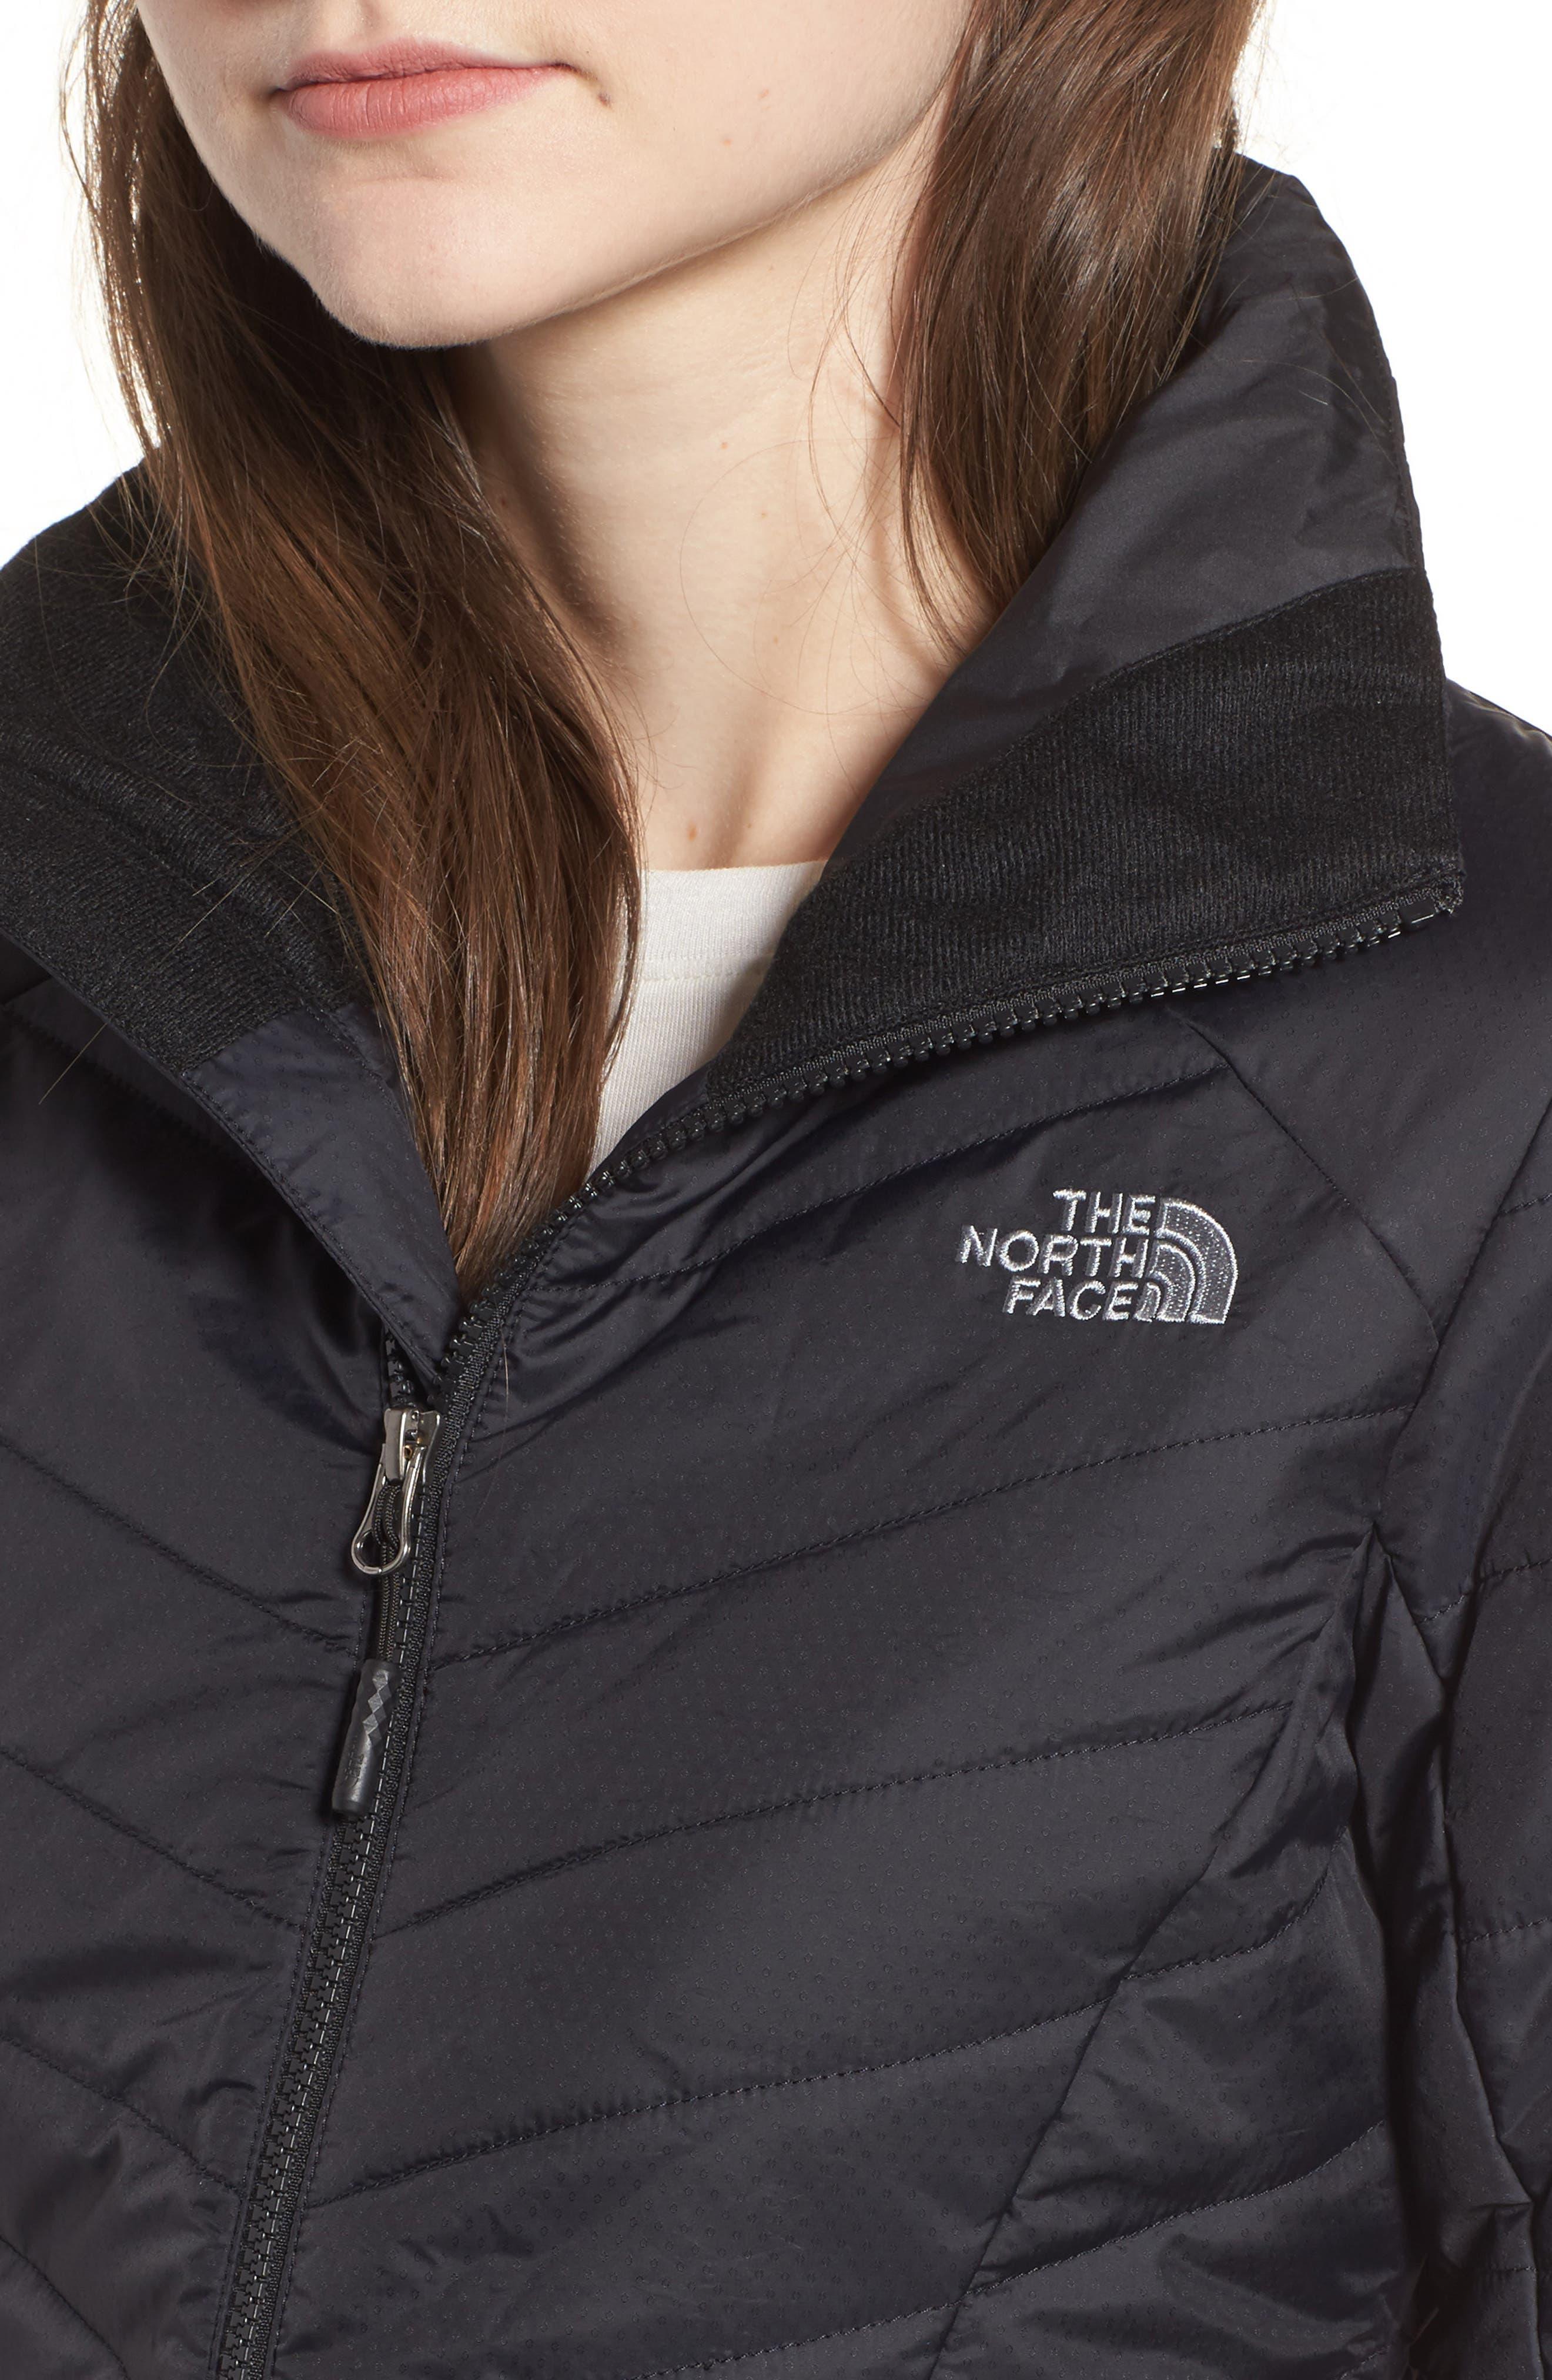 Moonlight Heatseeker Insulated Jacket,                             Alternate thumbnail 4, color,                             001